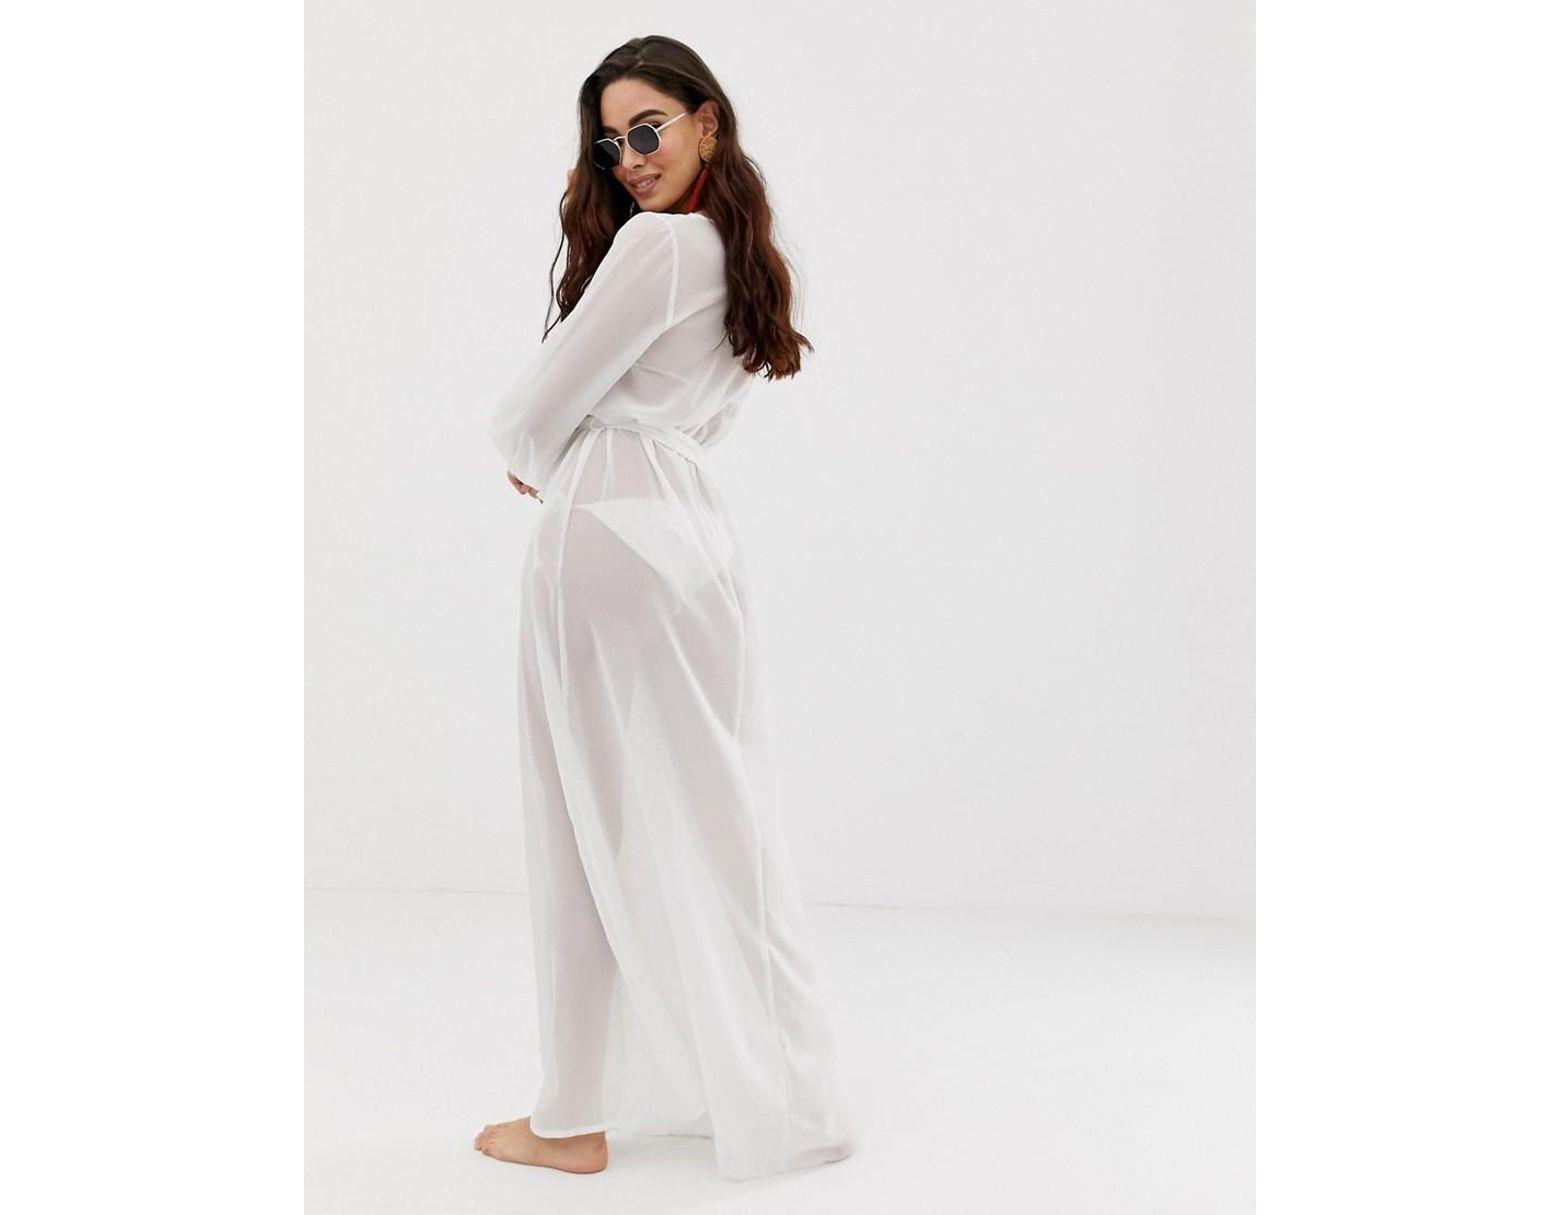 d8191dfb42 ASOS Recycled Long Sleeve Wrap Tie Chiffon Maxi Beach Kimono In White in  White - Lyst